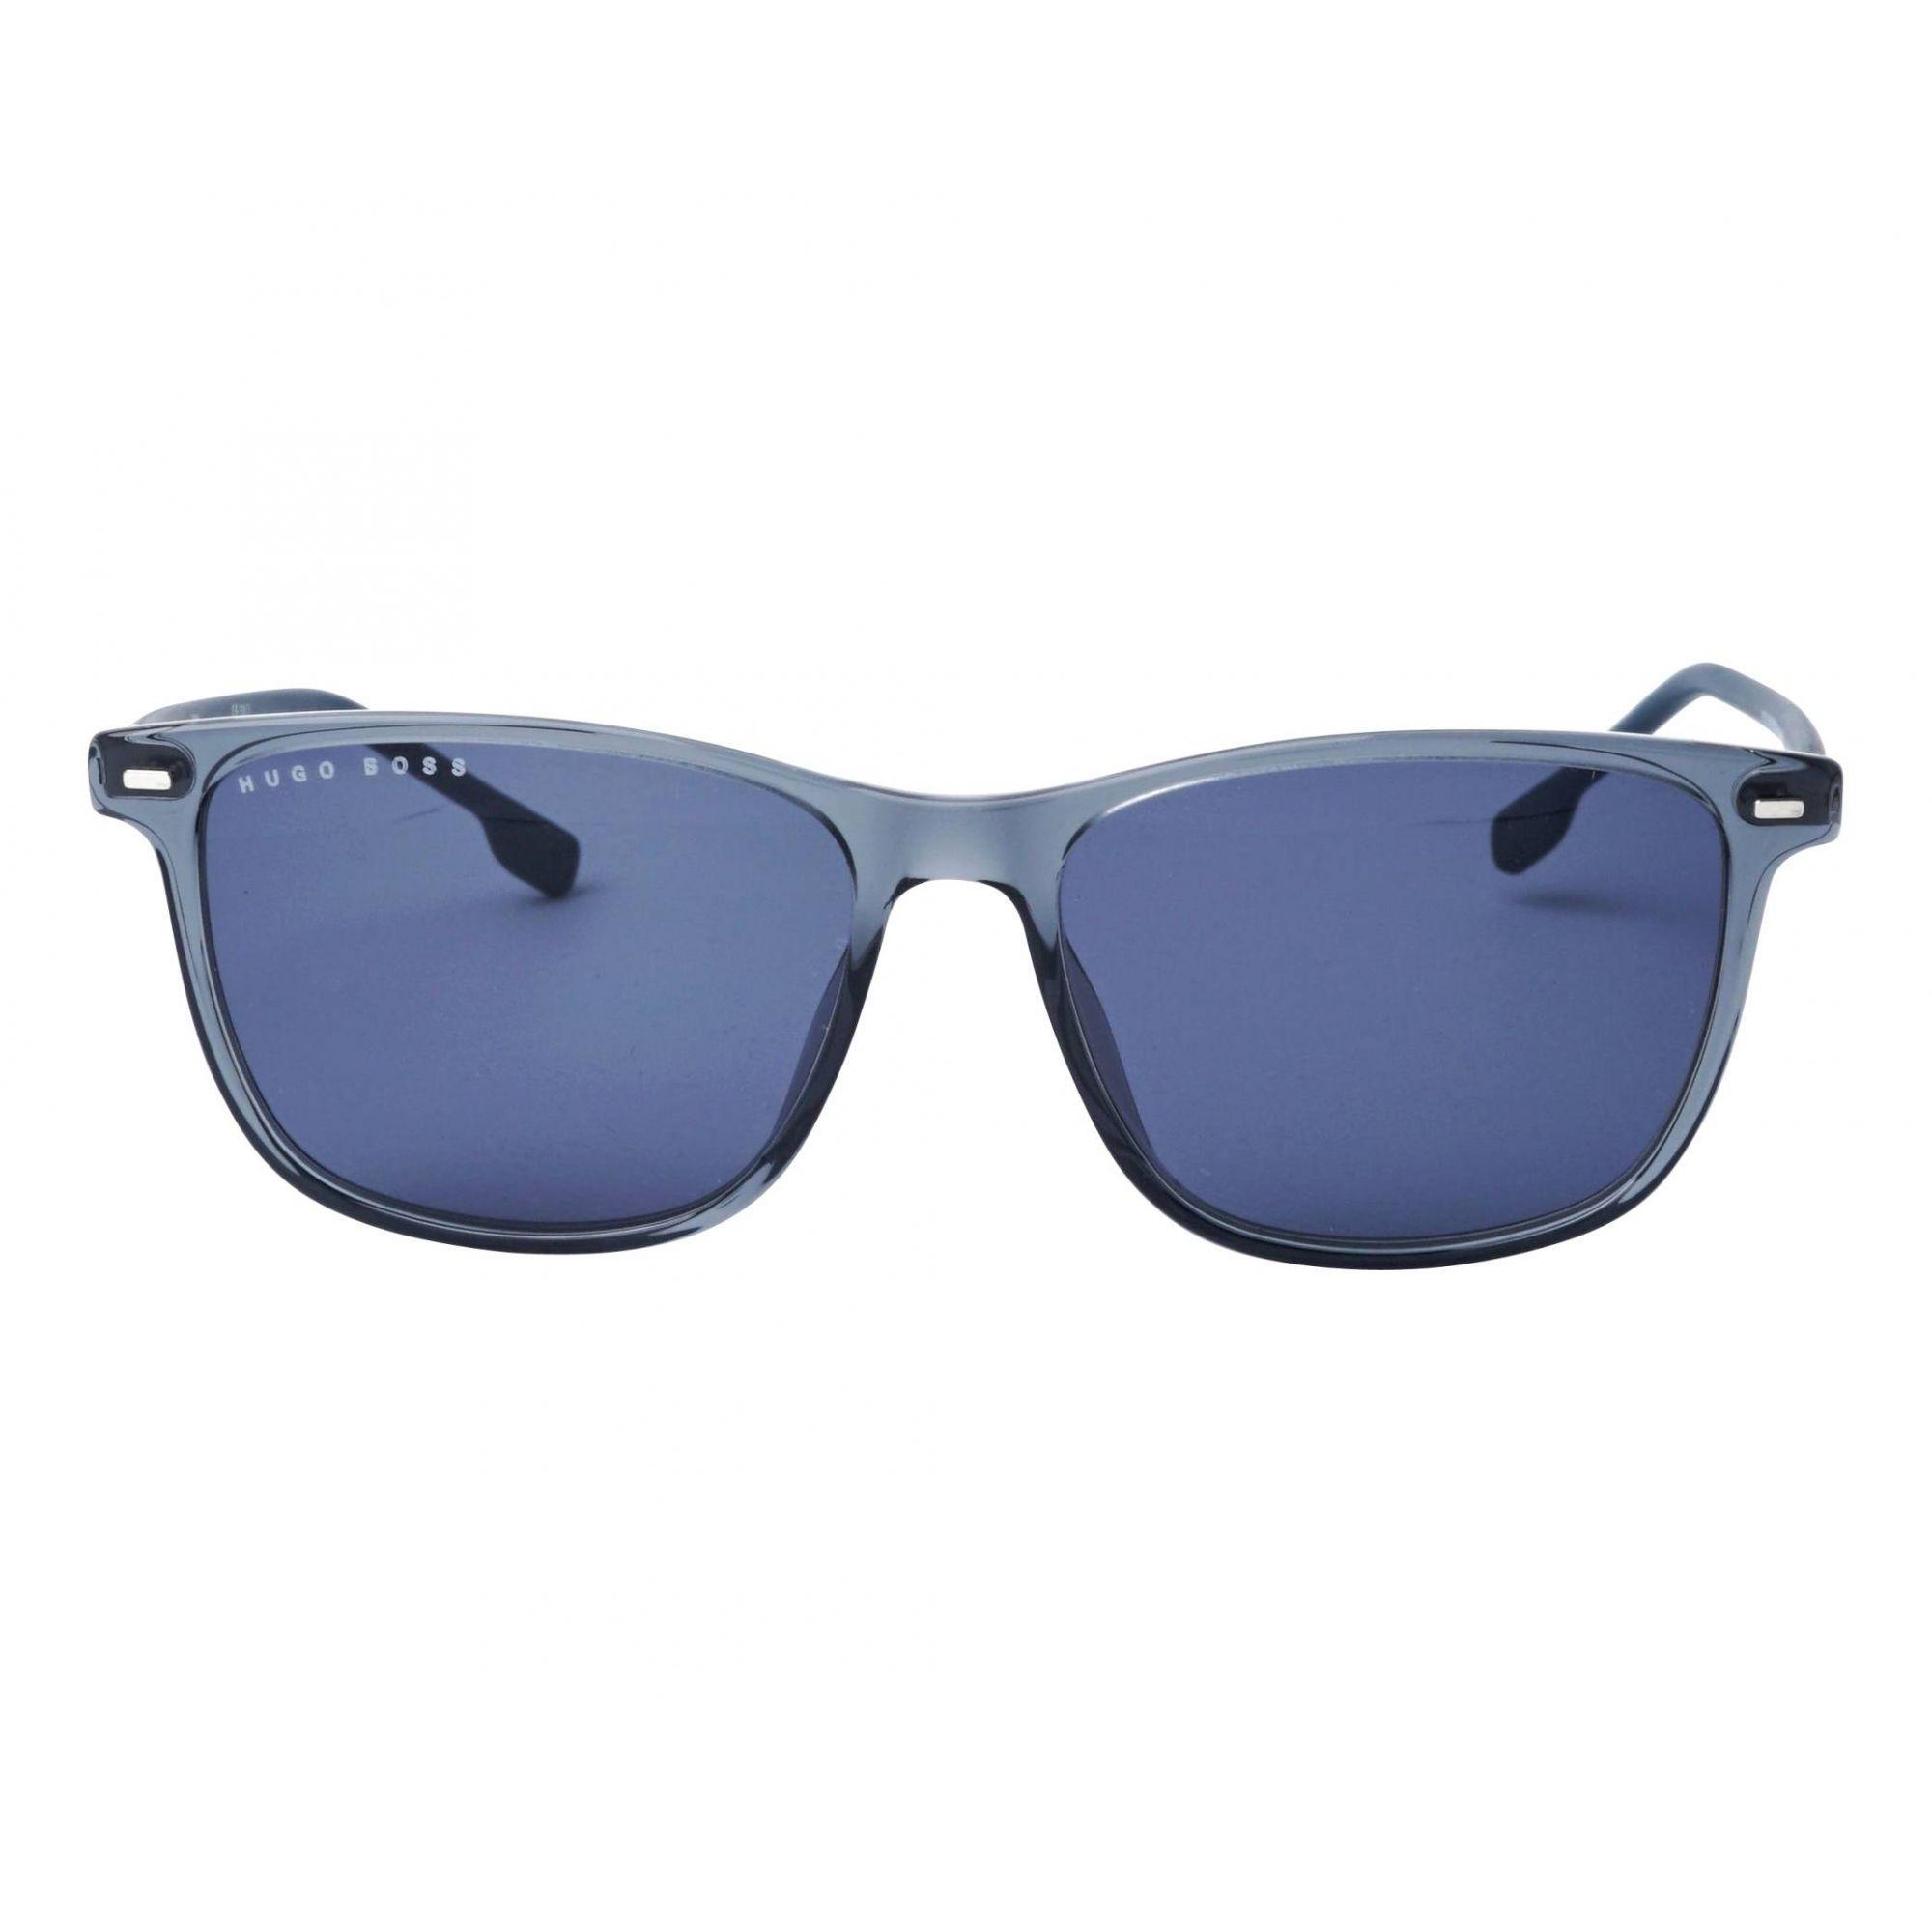 f97369af4cf94 Óculos de Sol Hugo Boss 1009 S KB7KU - Omega Ótica e Relojoaria